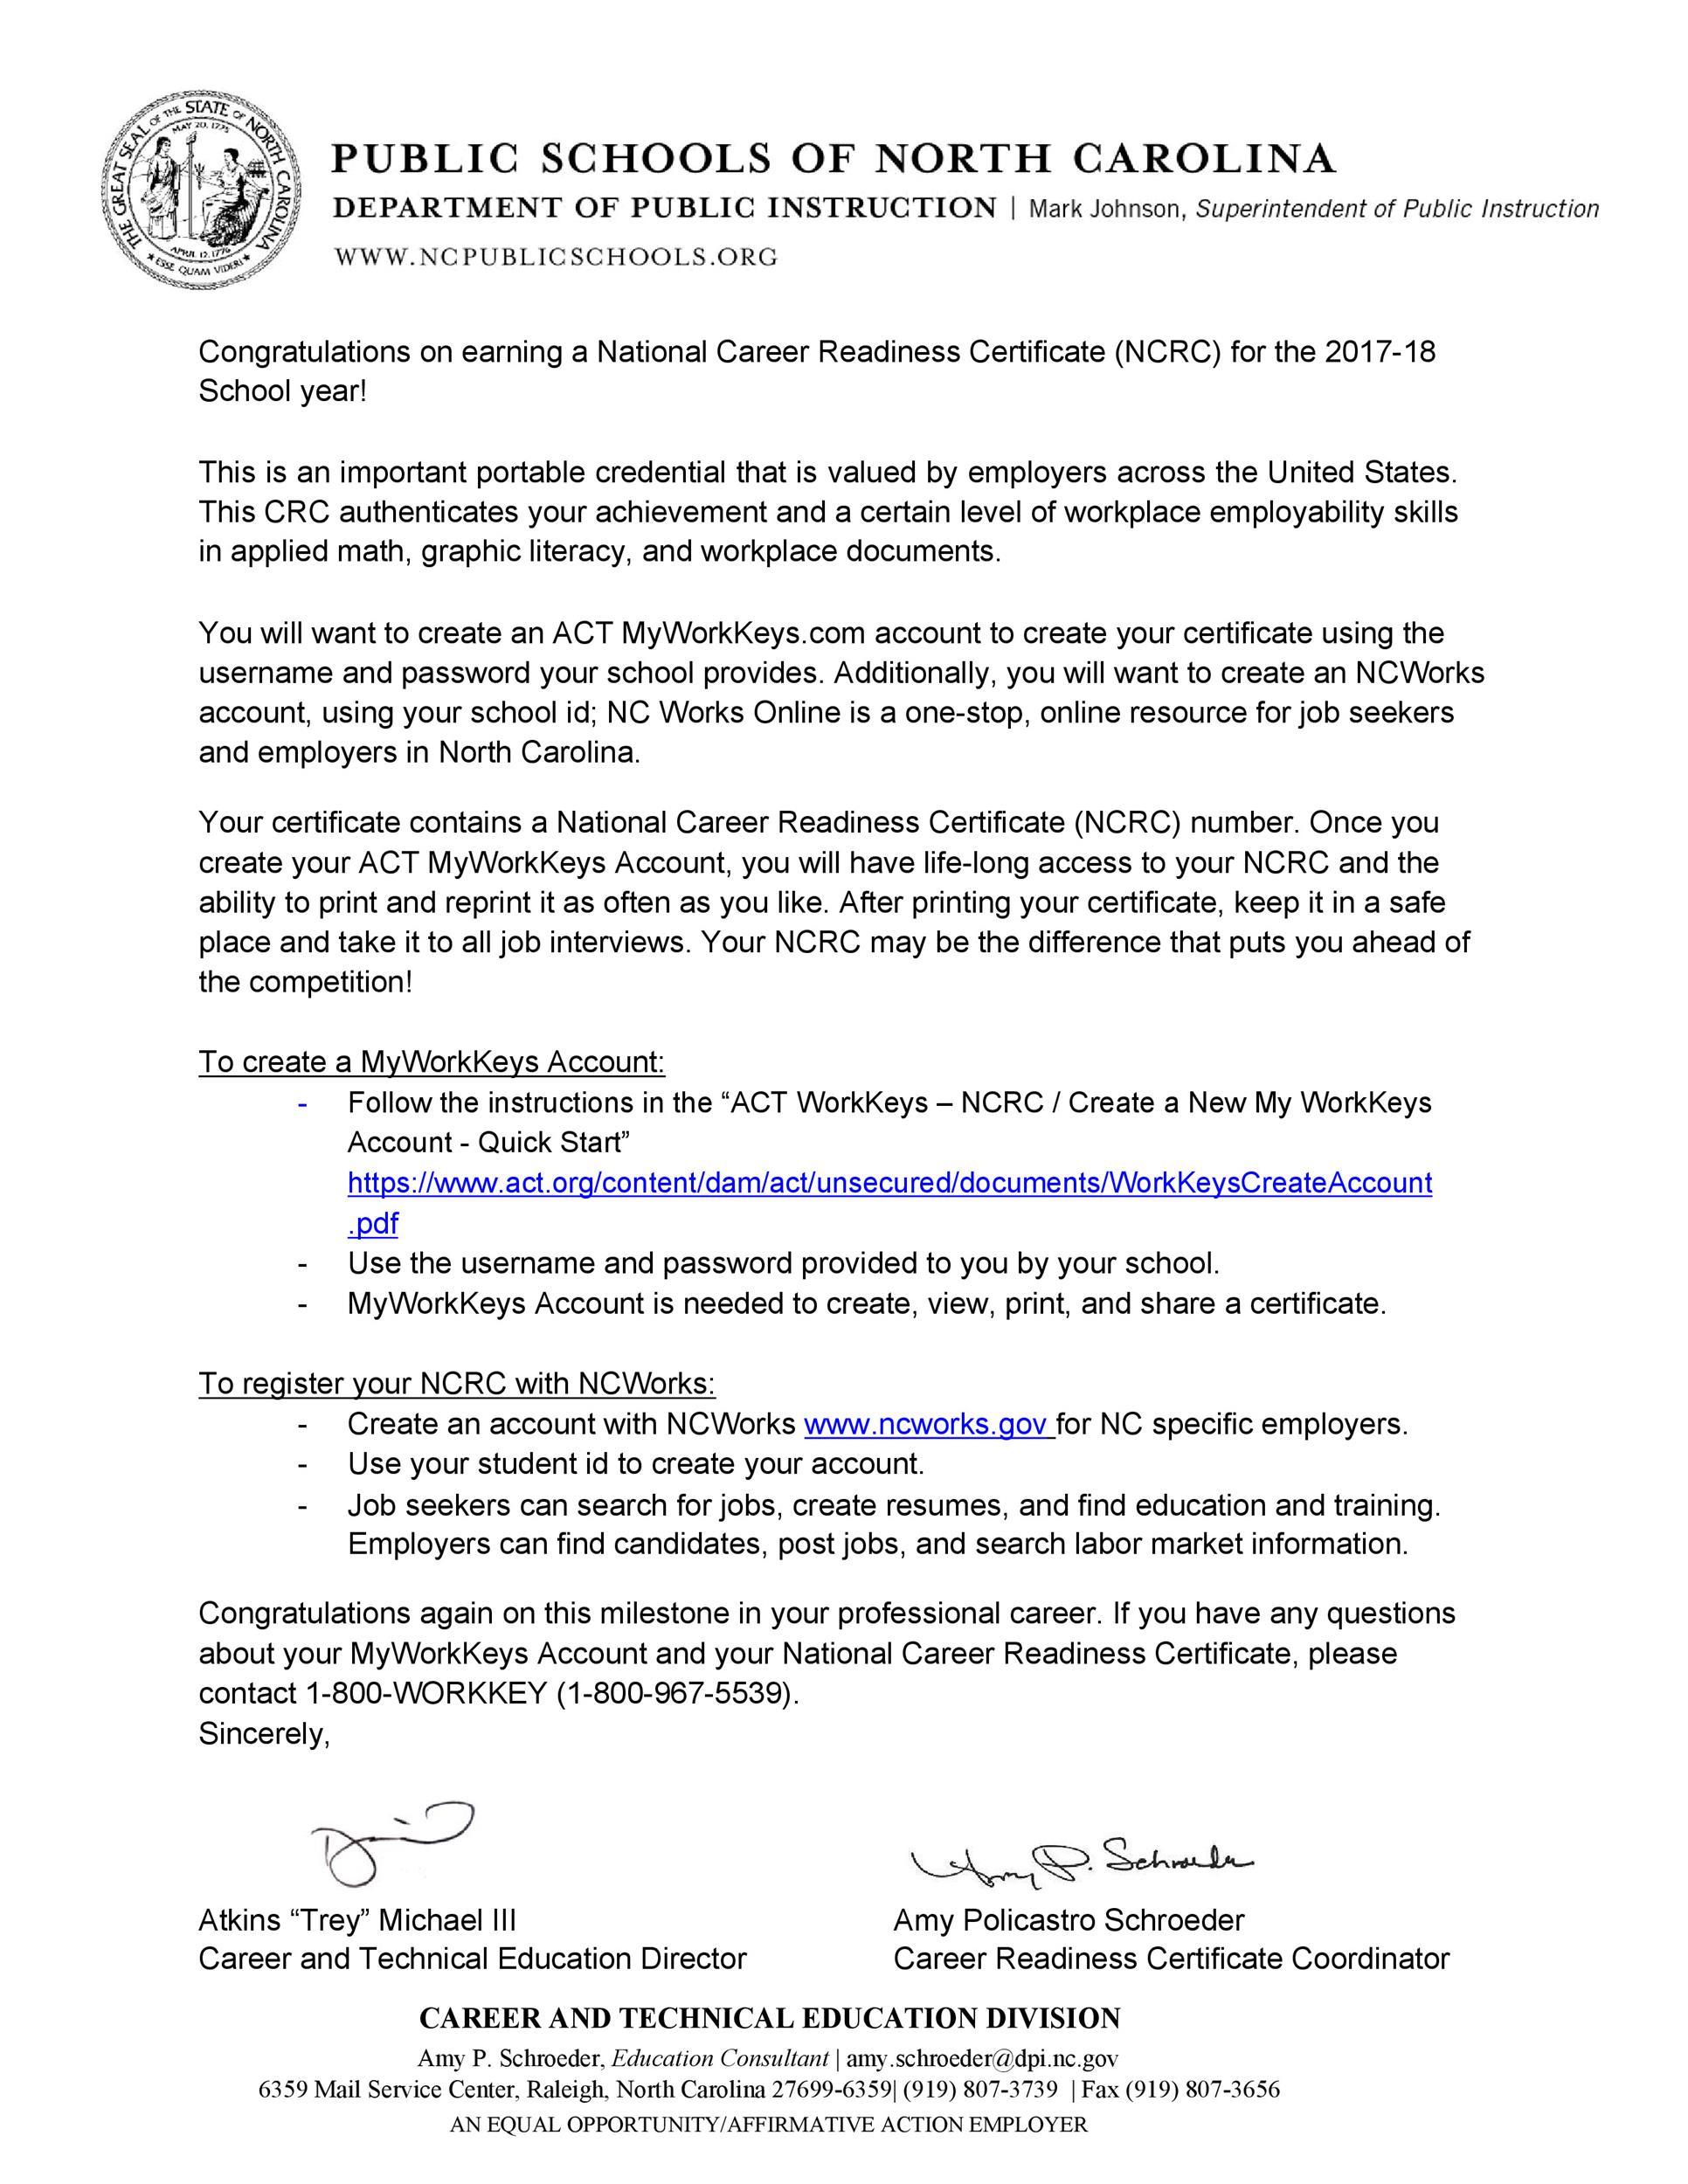 Free congratulations letter 19